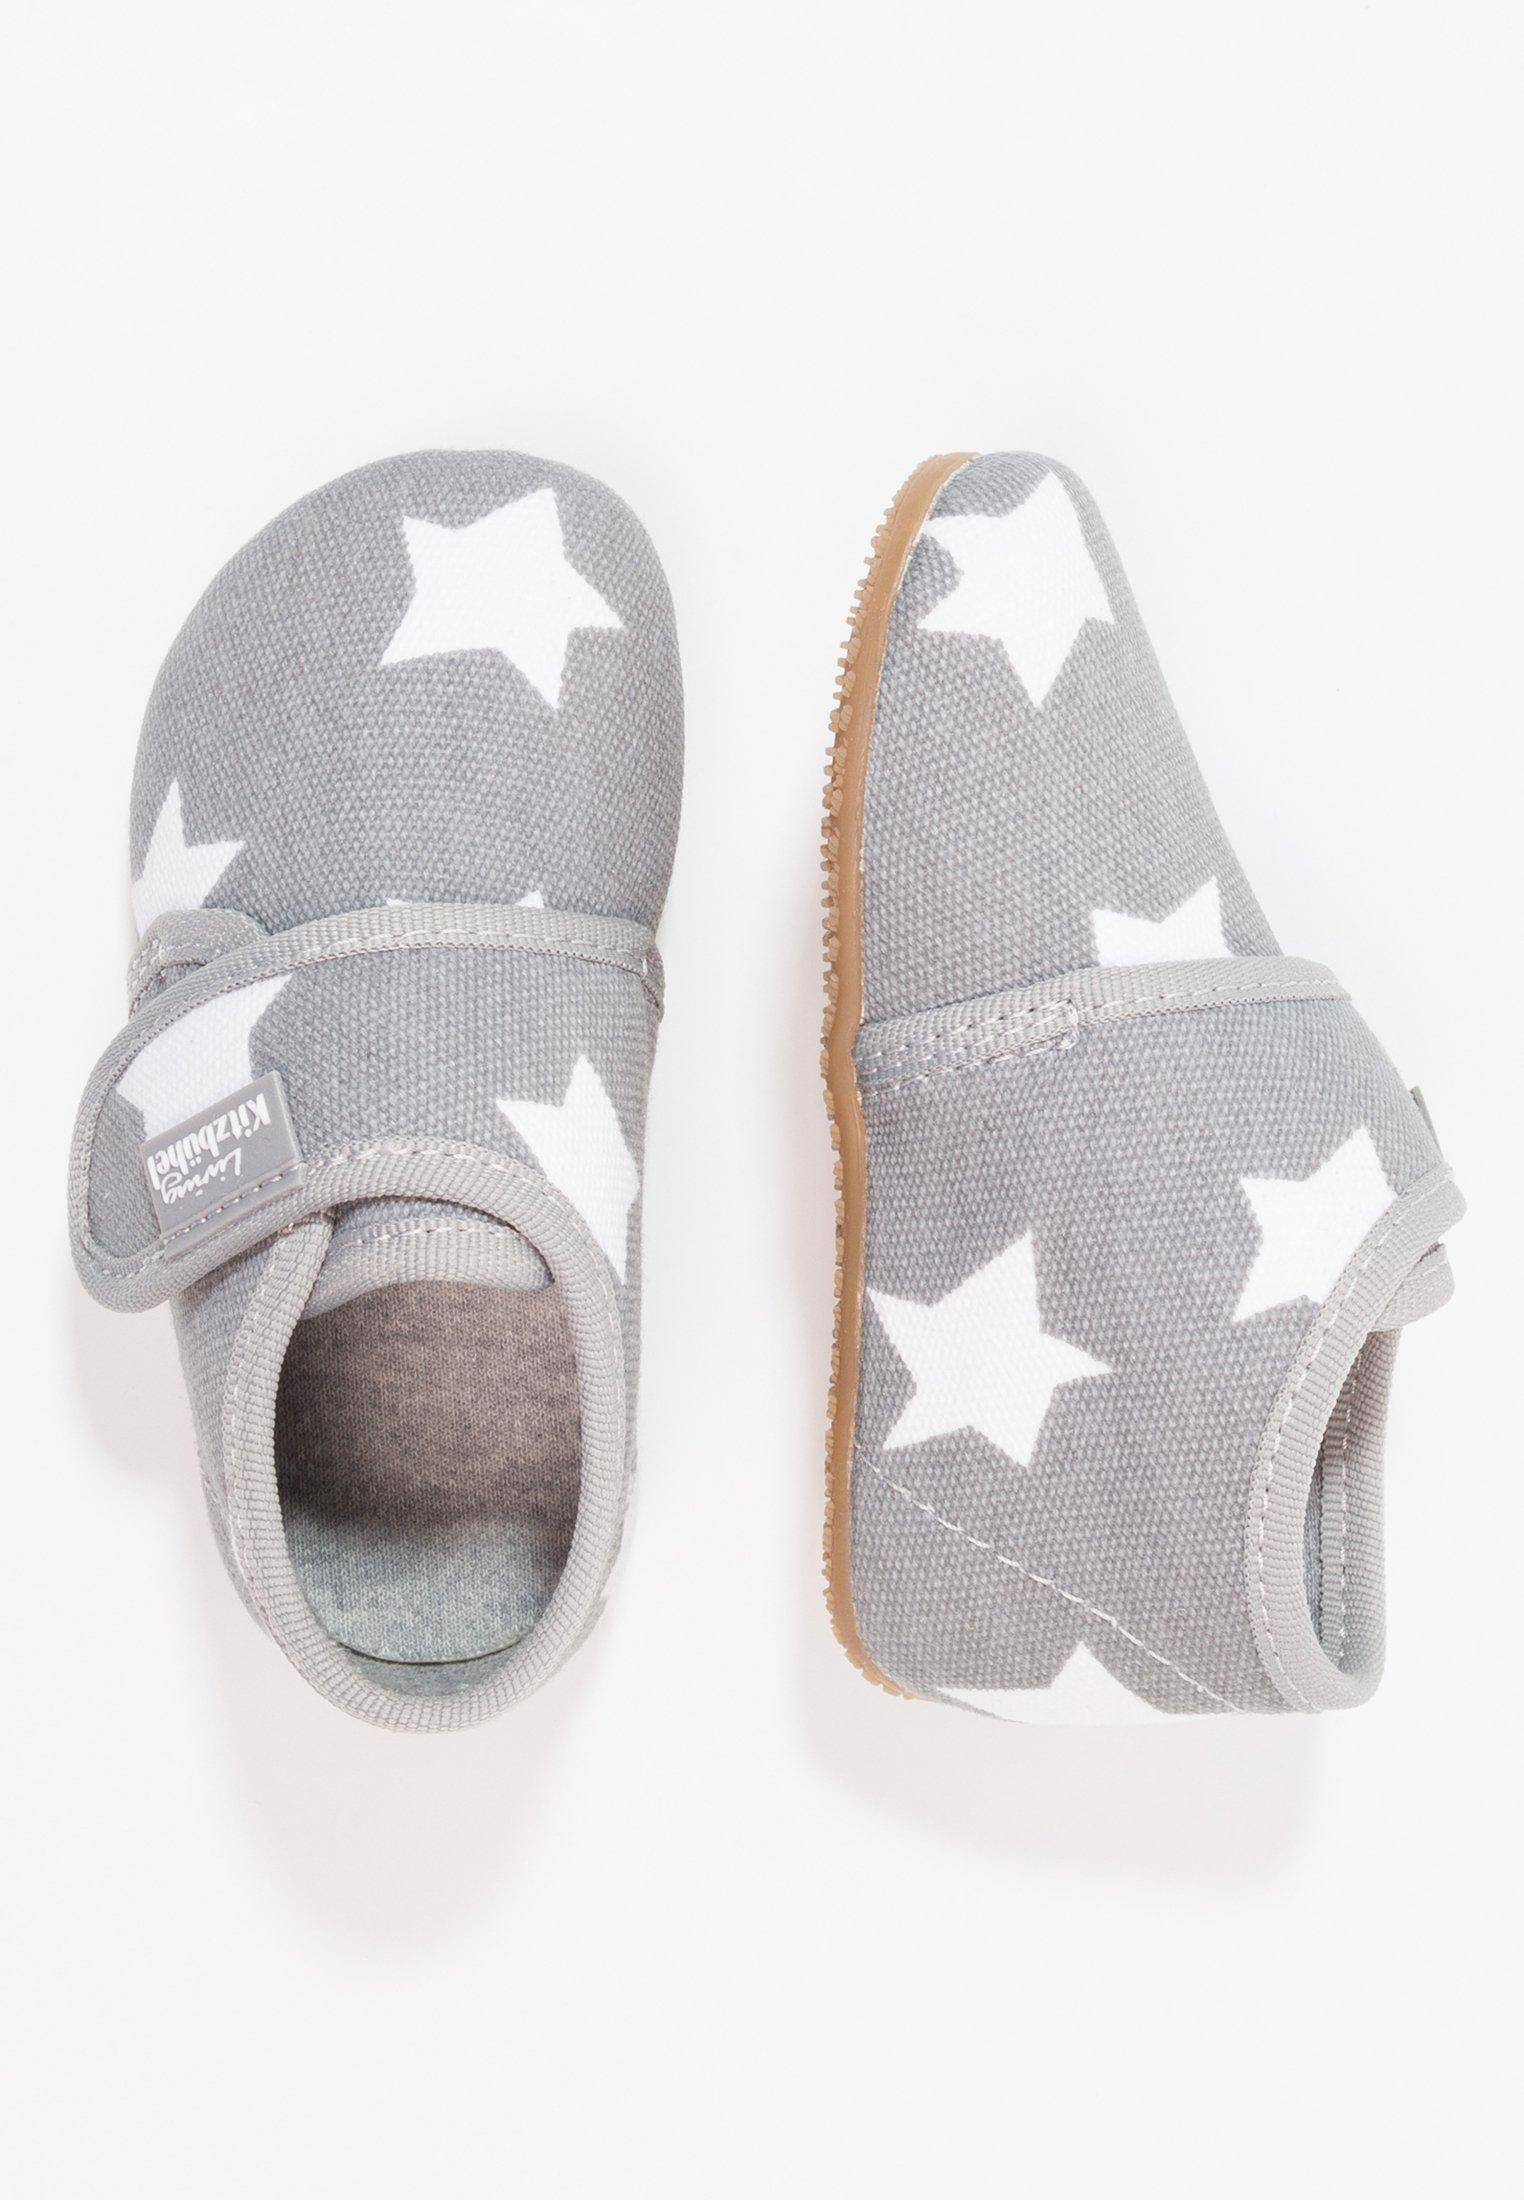 Recommend Cheap Cheapest Living Kitzbühel Slippers - hellgrau   kids shoes 2020 OY8U0